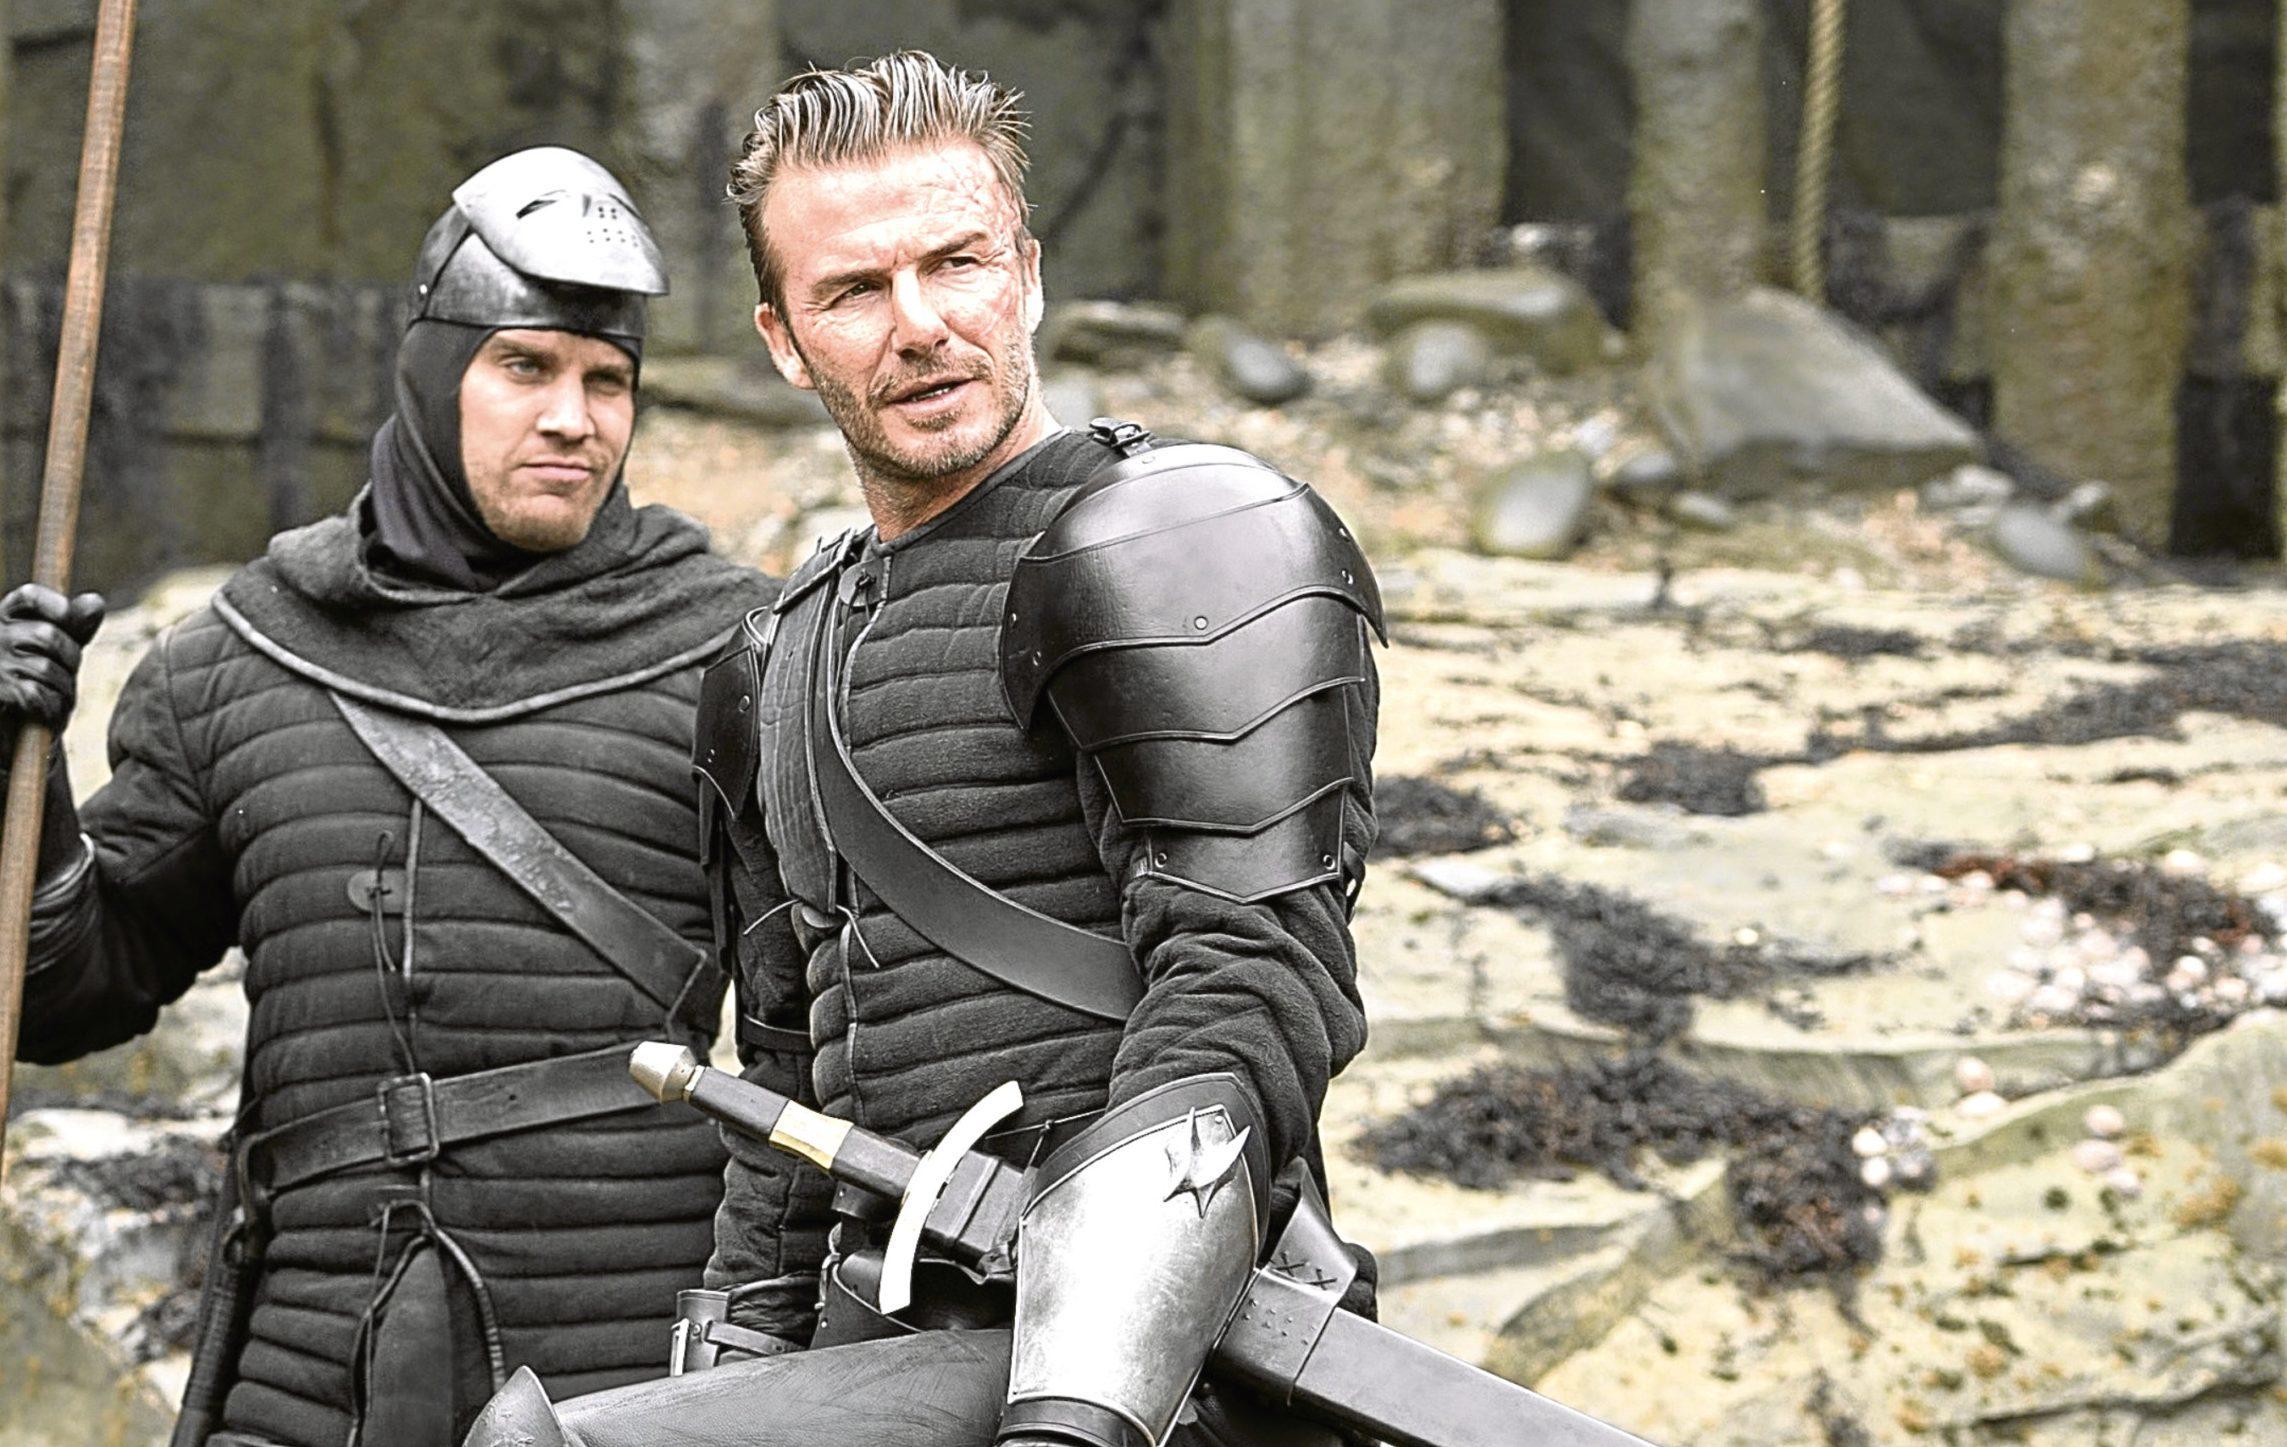 David Beckham's cameo in King Arthur: Legend of the Sword  (Allstar/WARNER BROS.)